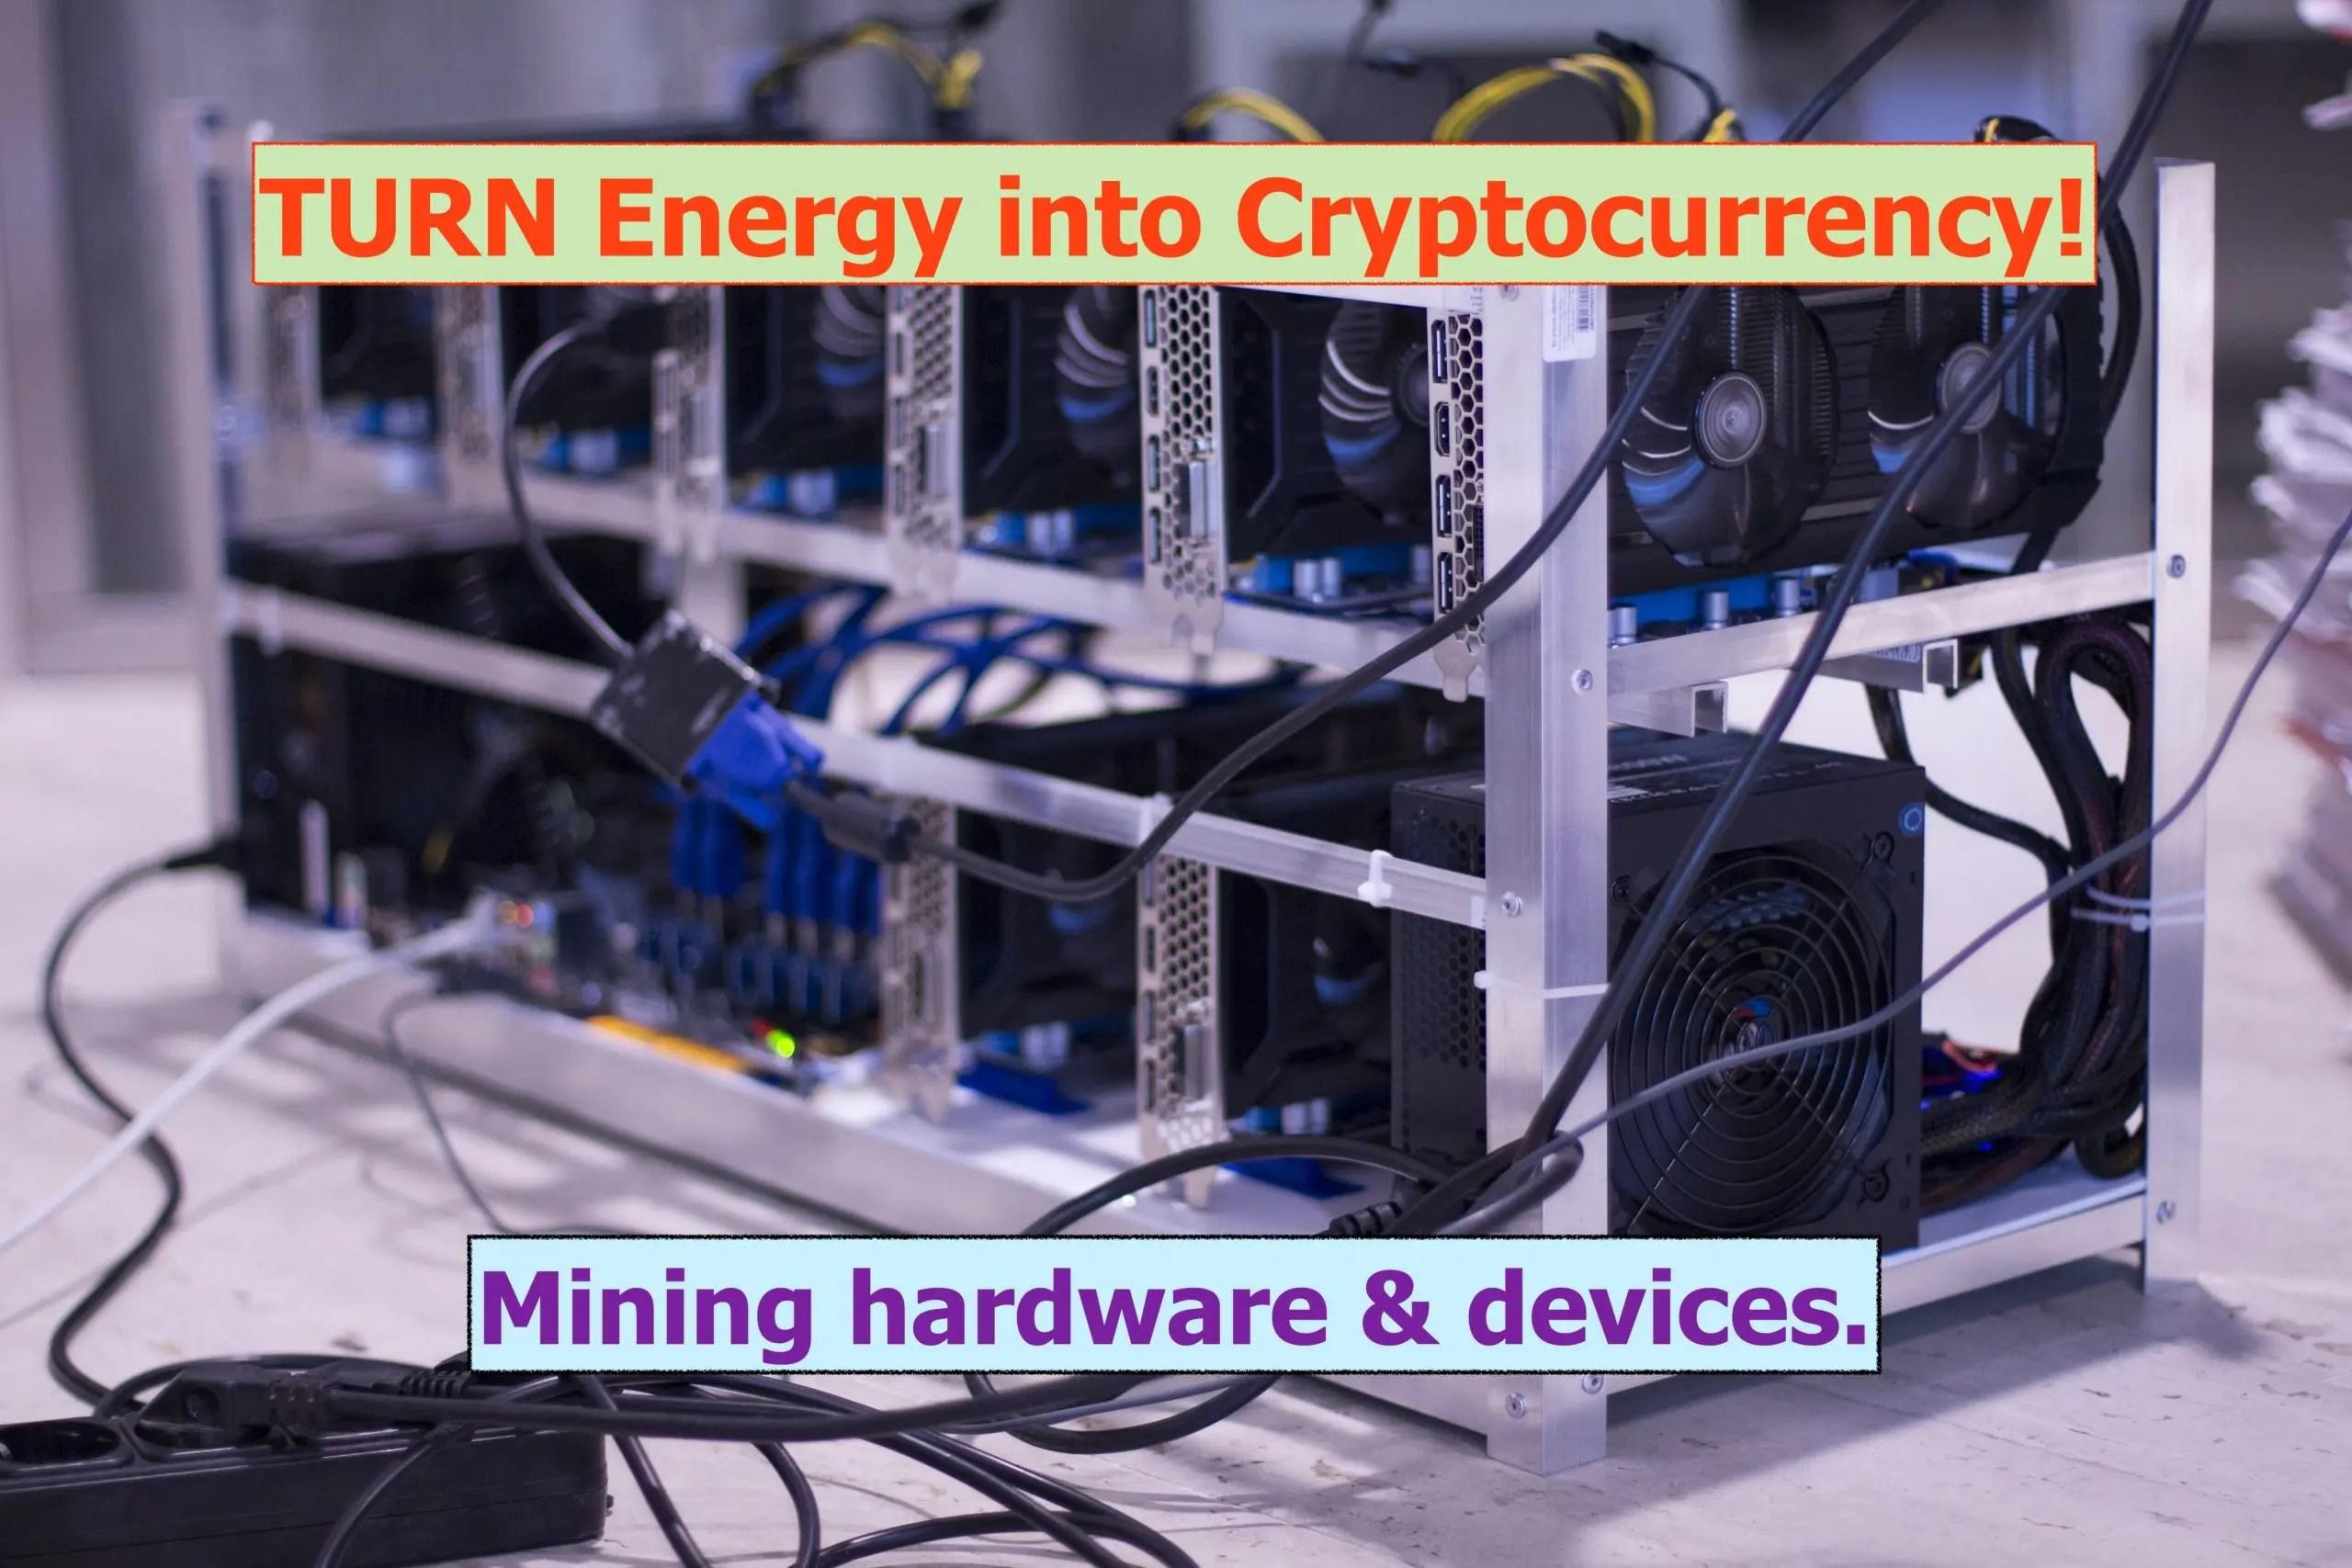 Turn energy into crypto!